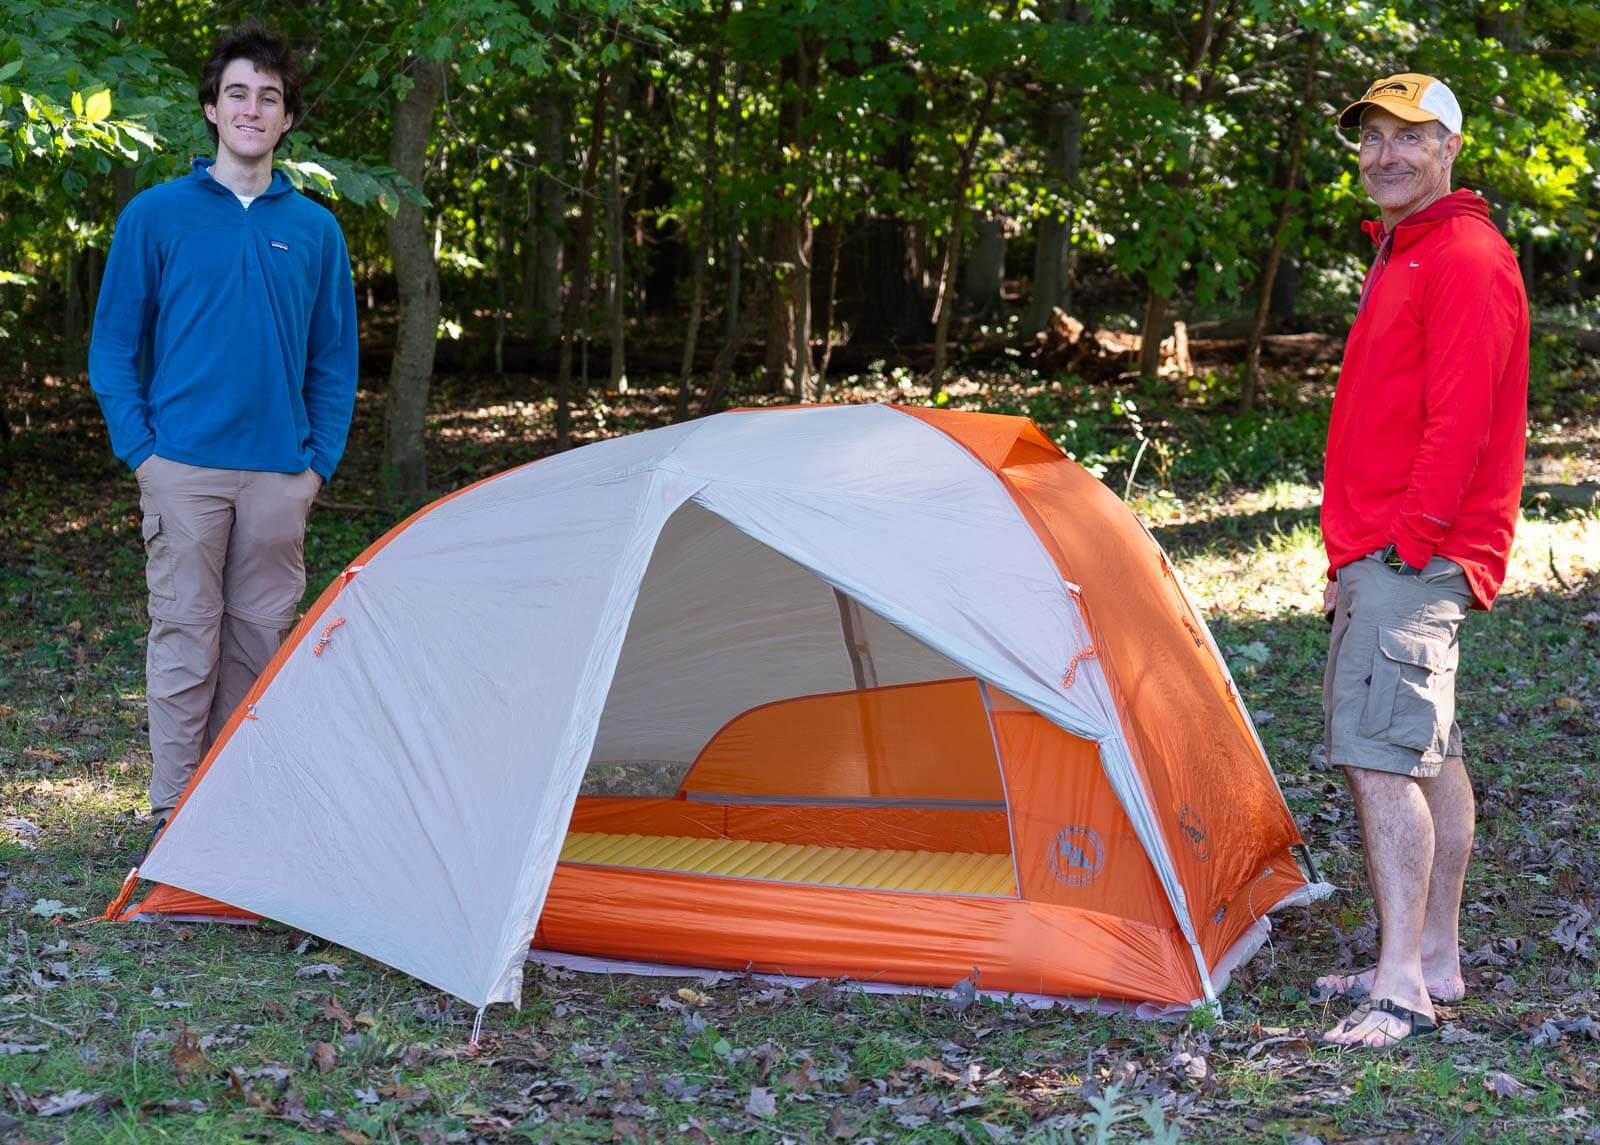 Lightweight Backpacking Tent - BIG AGNES COPPER SPUR HV UL2 & 2019 Best Backpacking Tents   Lightweight u0026 Ultralight - Adventure Alan